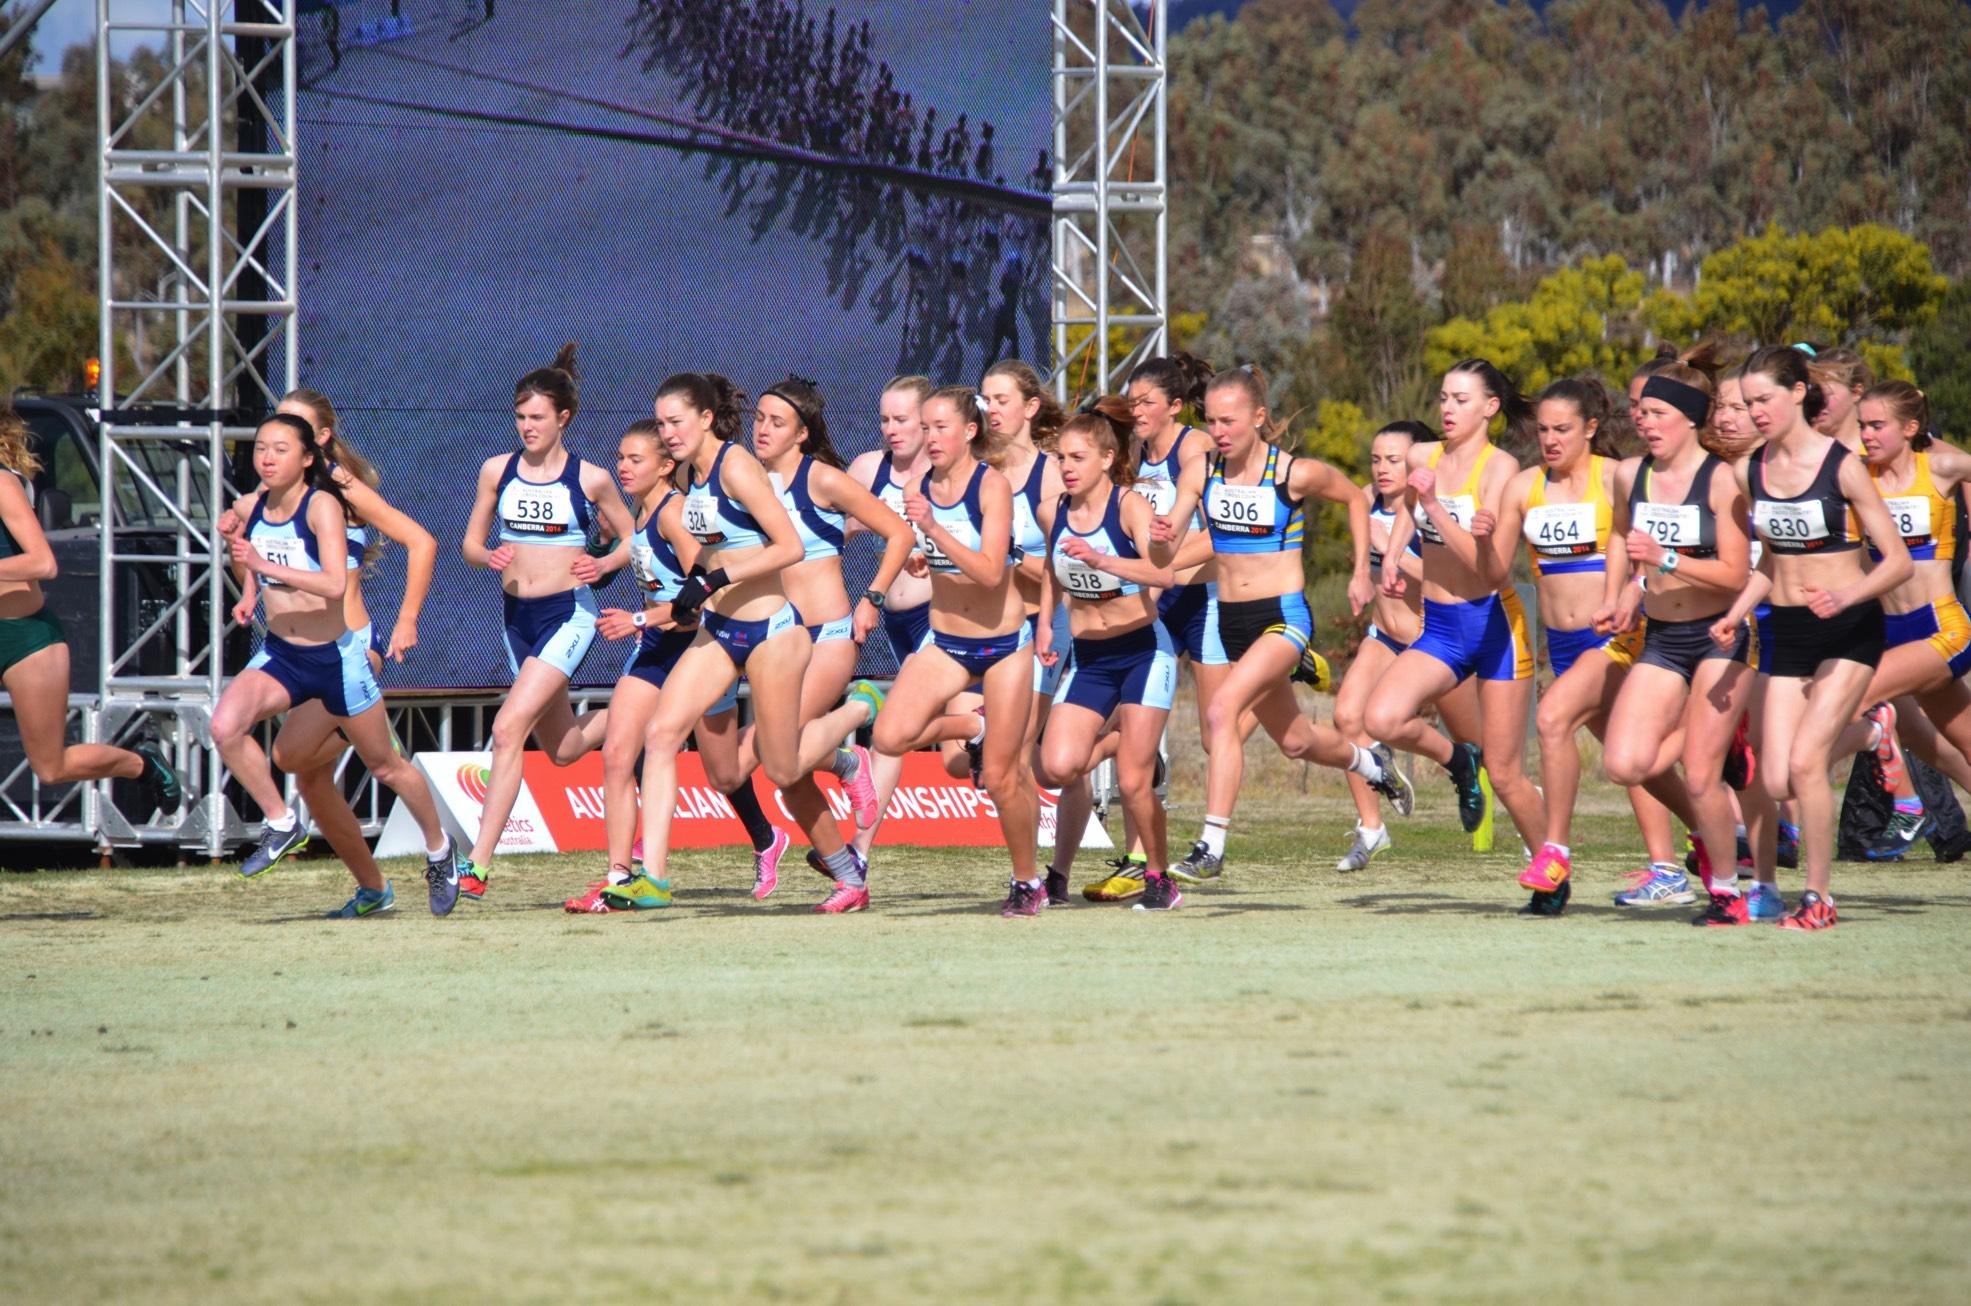 2016 Australian National XC Championships: Photo By Ewa Facioni